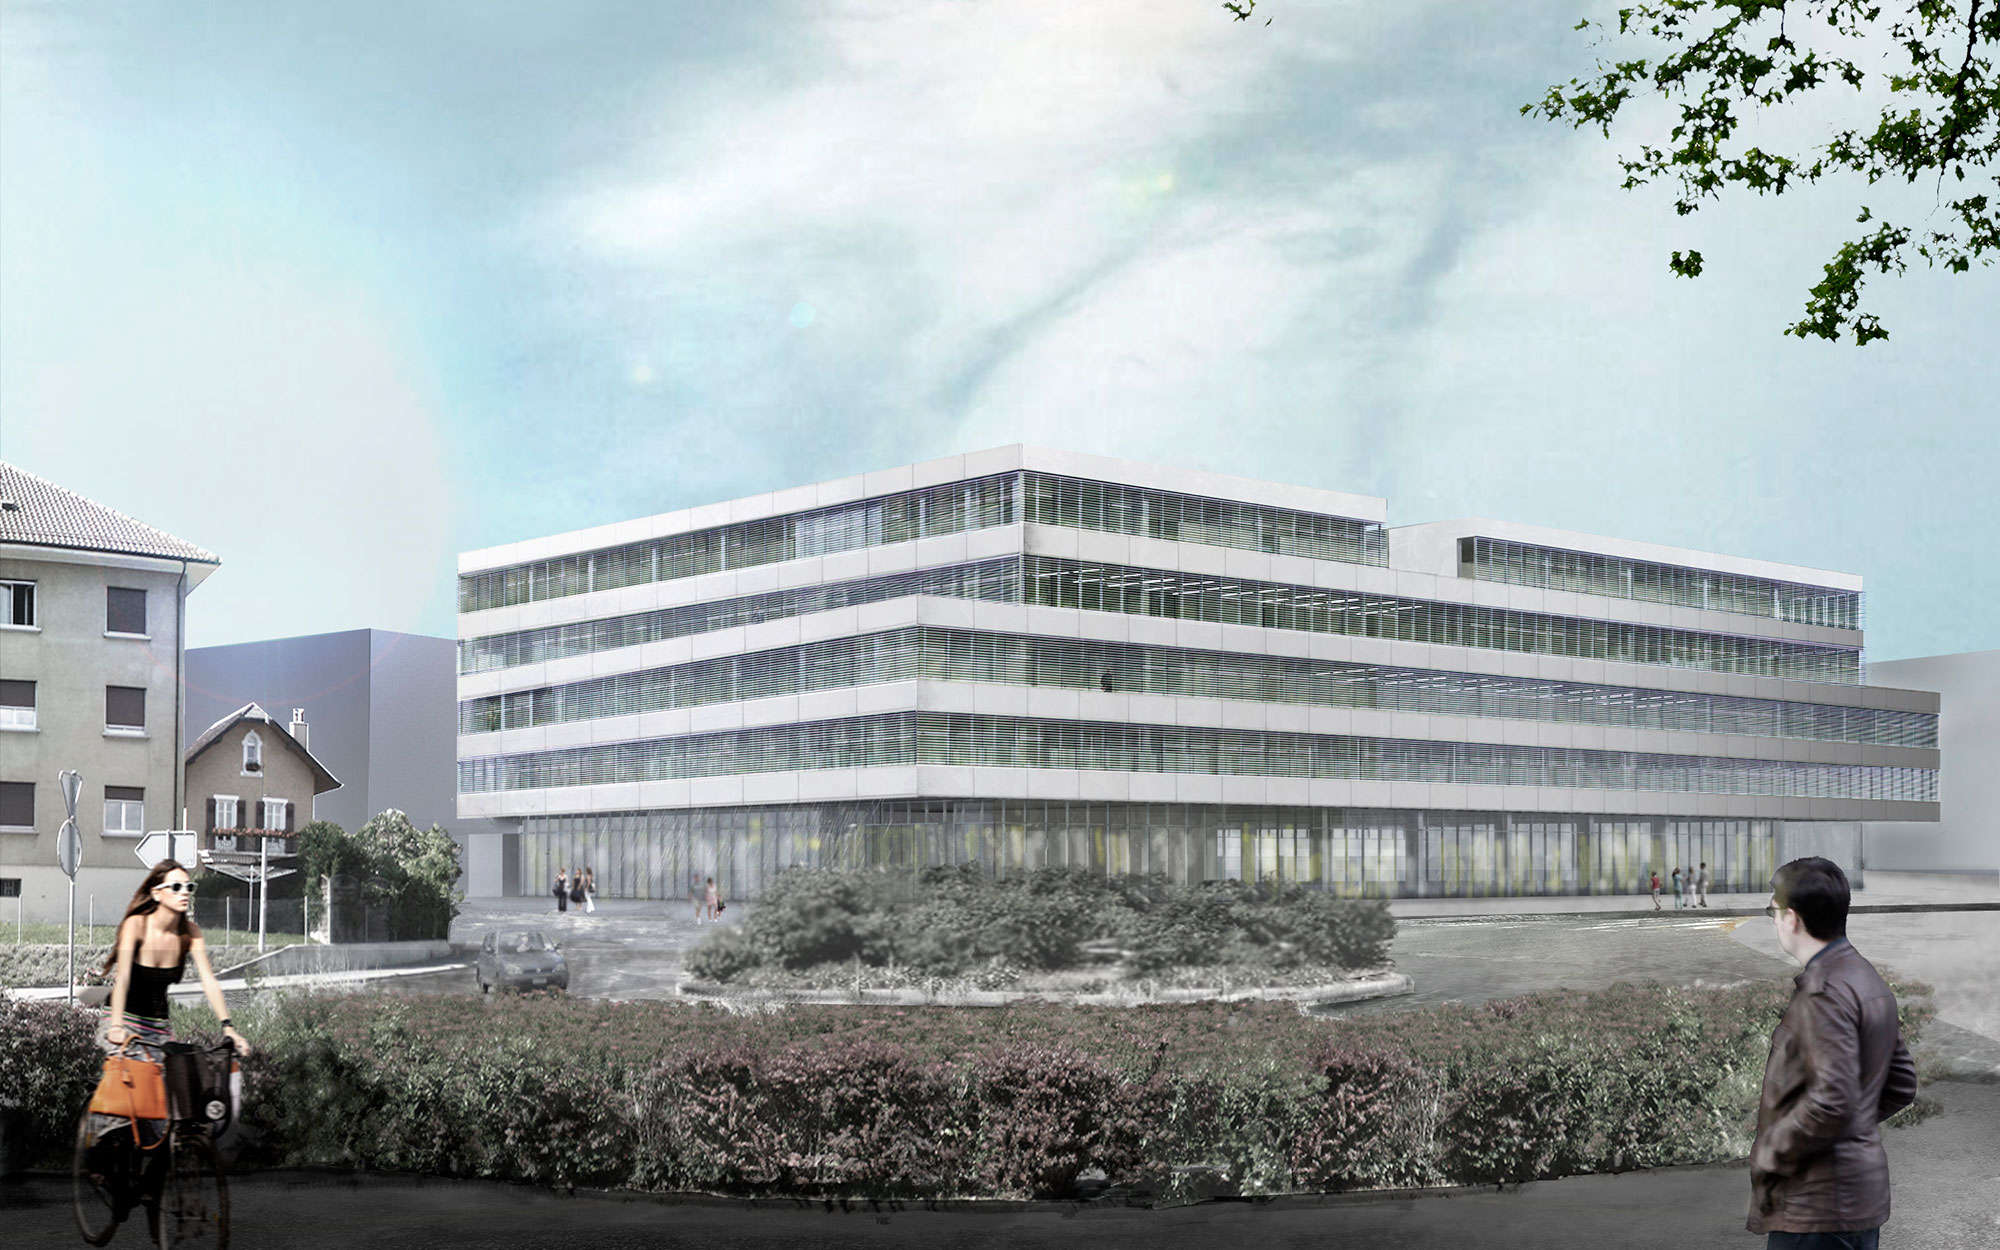 Edificio educación secundaria en Lausanne